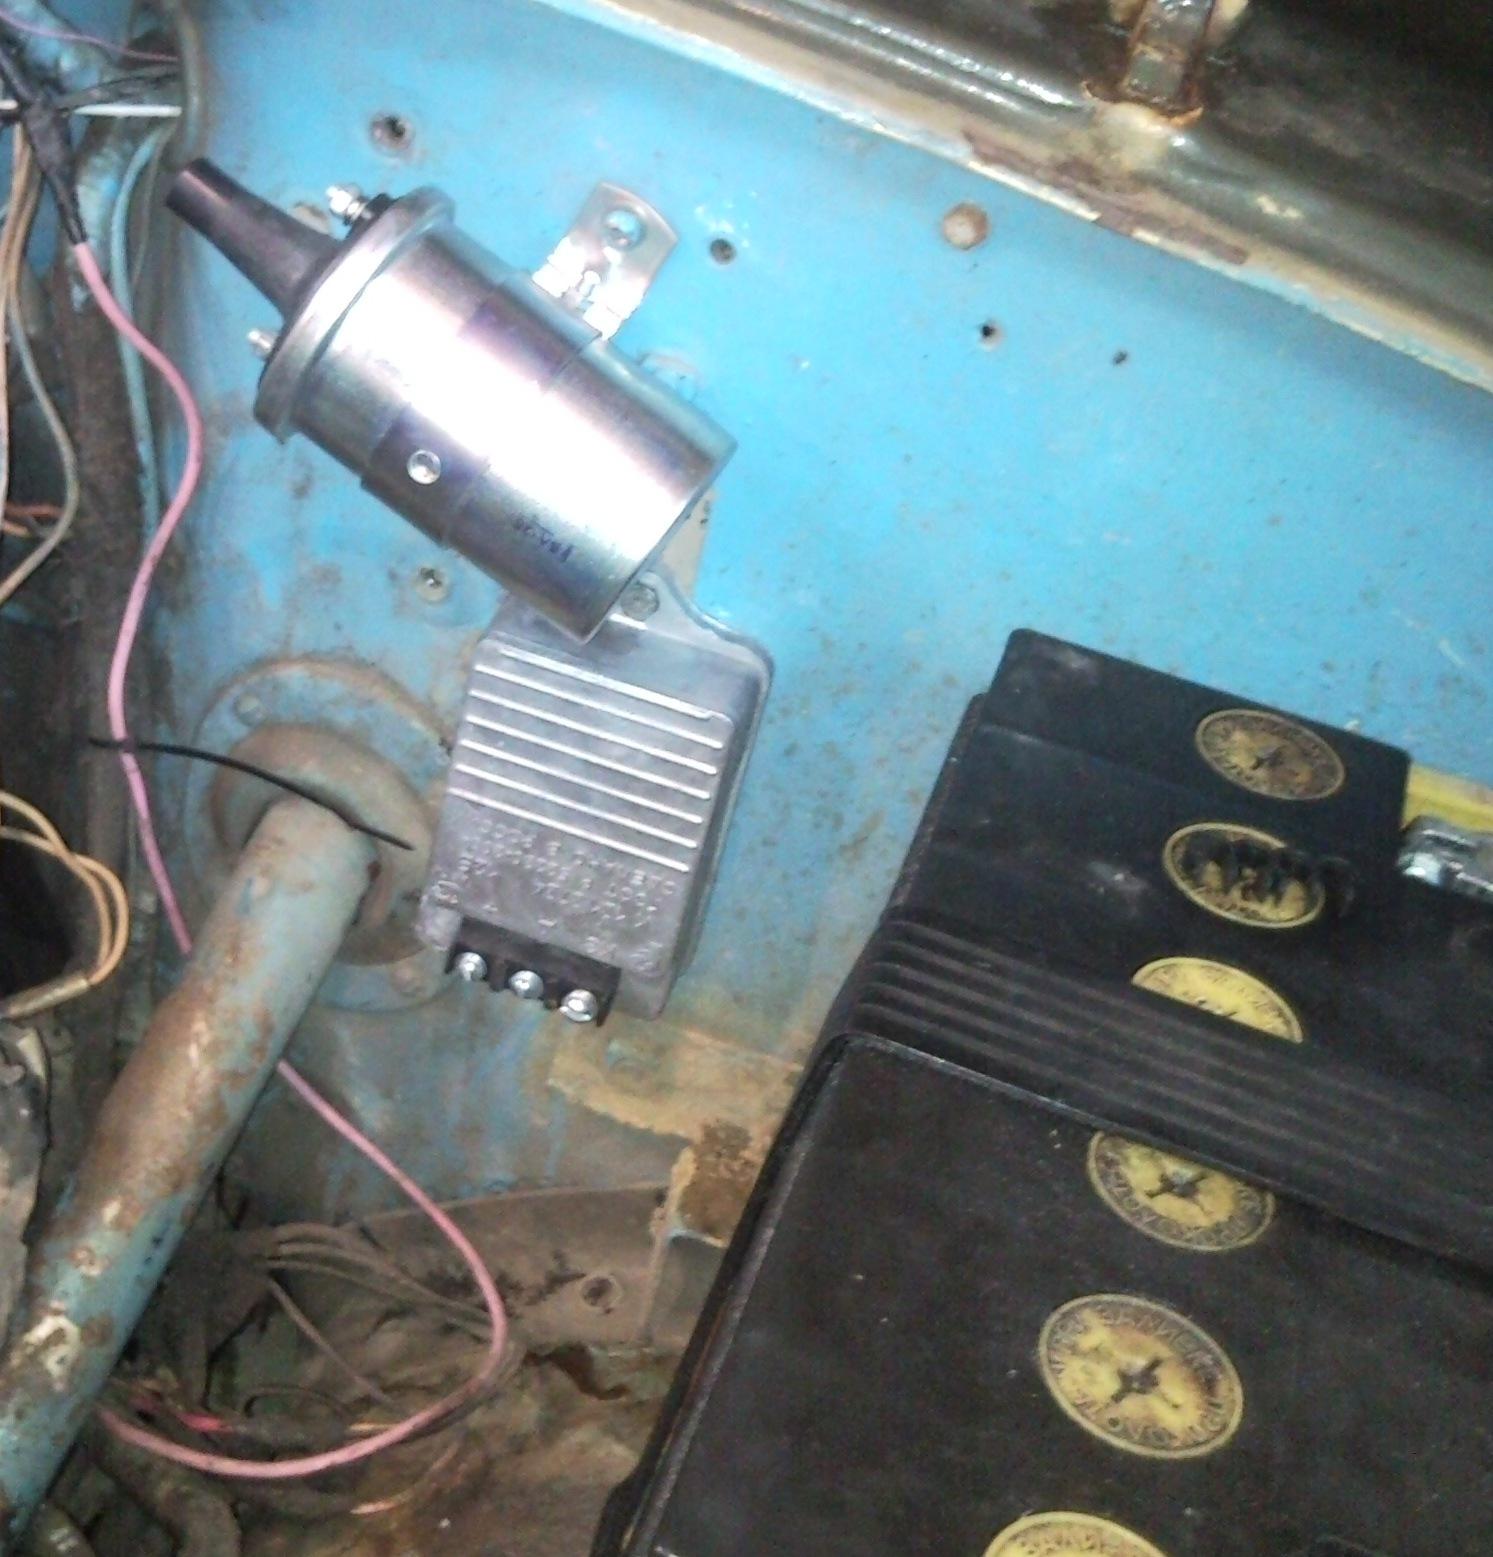 уаз 469 схема с электрозажиганием